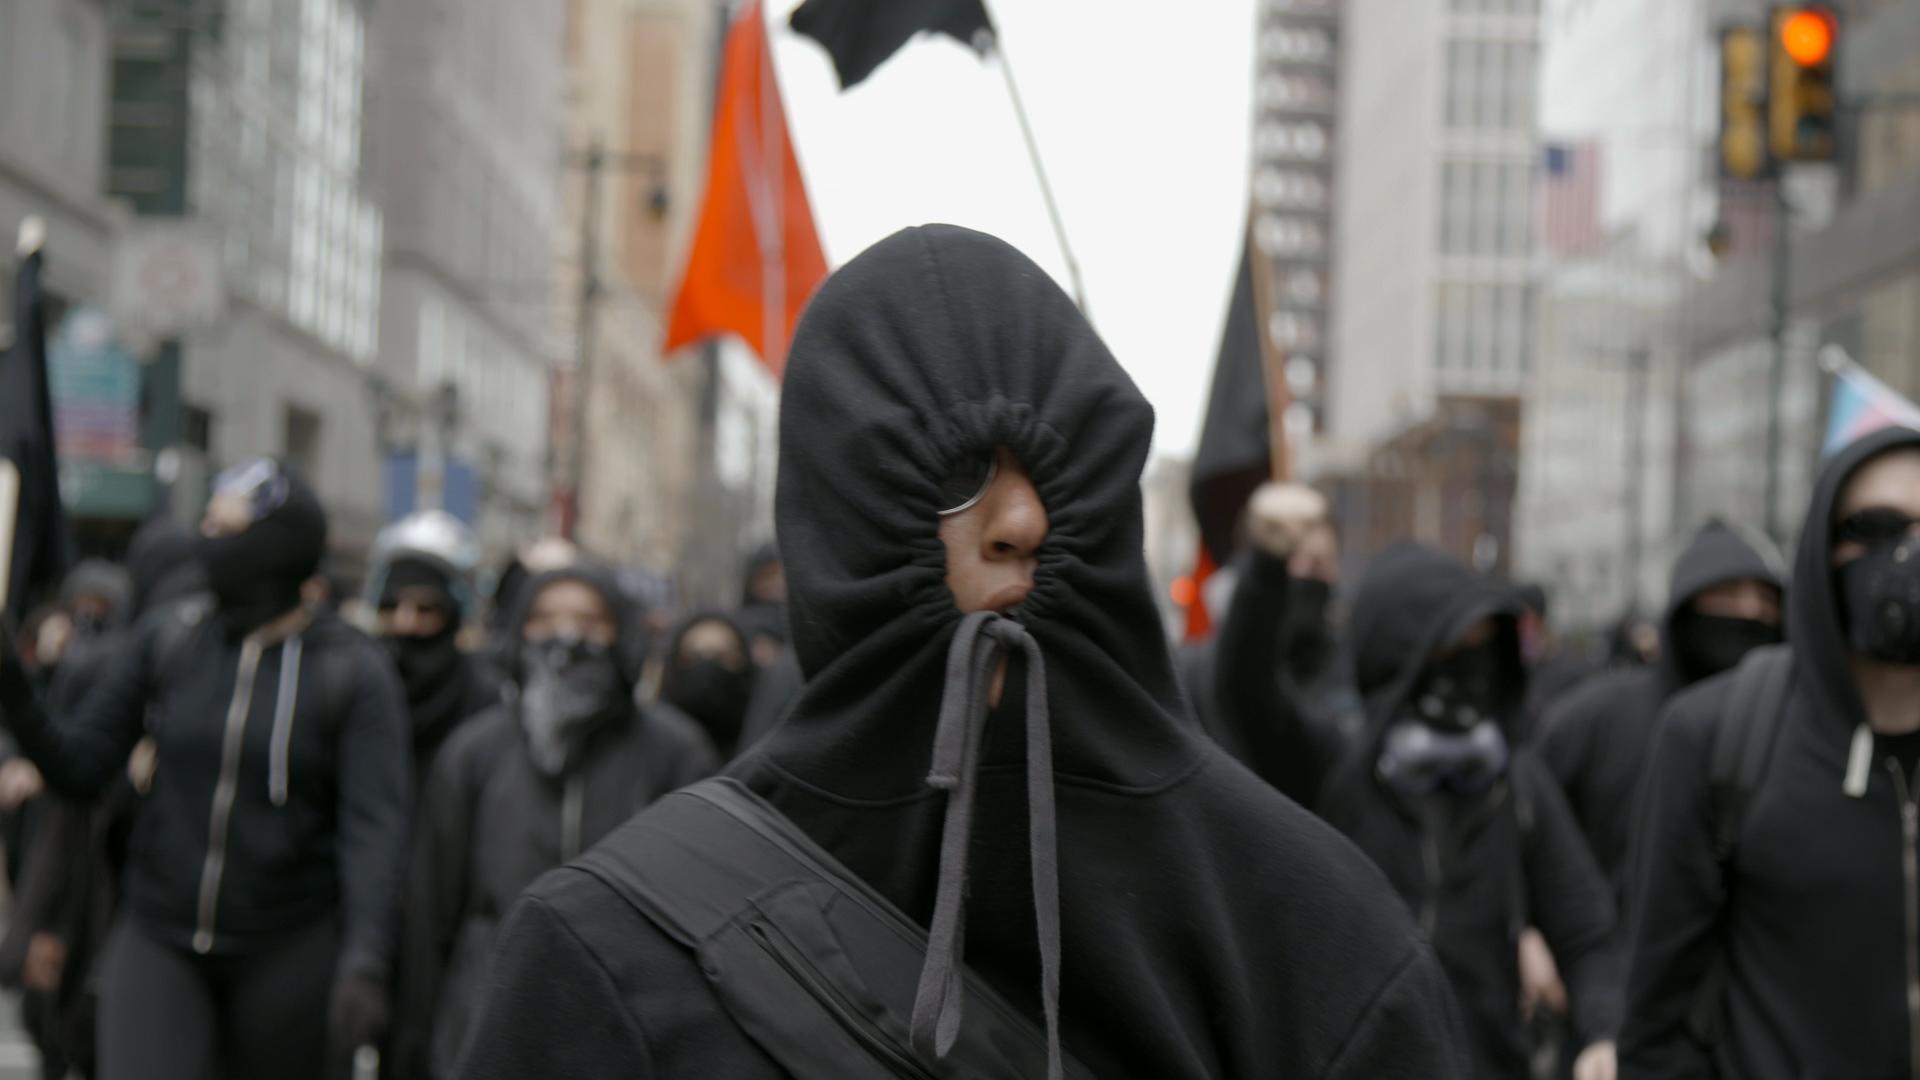 Philadelphia In The Fall Wallpaper The Black Bloc Inside America S Hard Left Vice Video